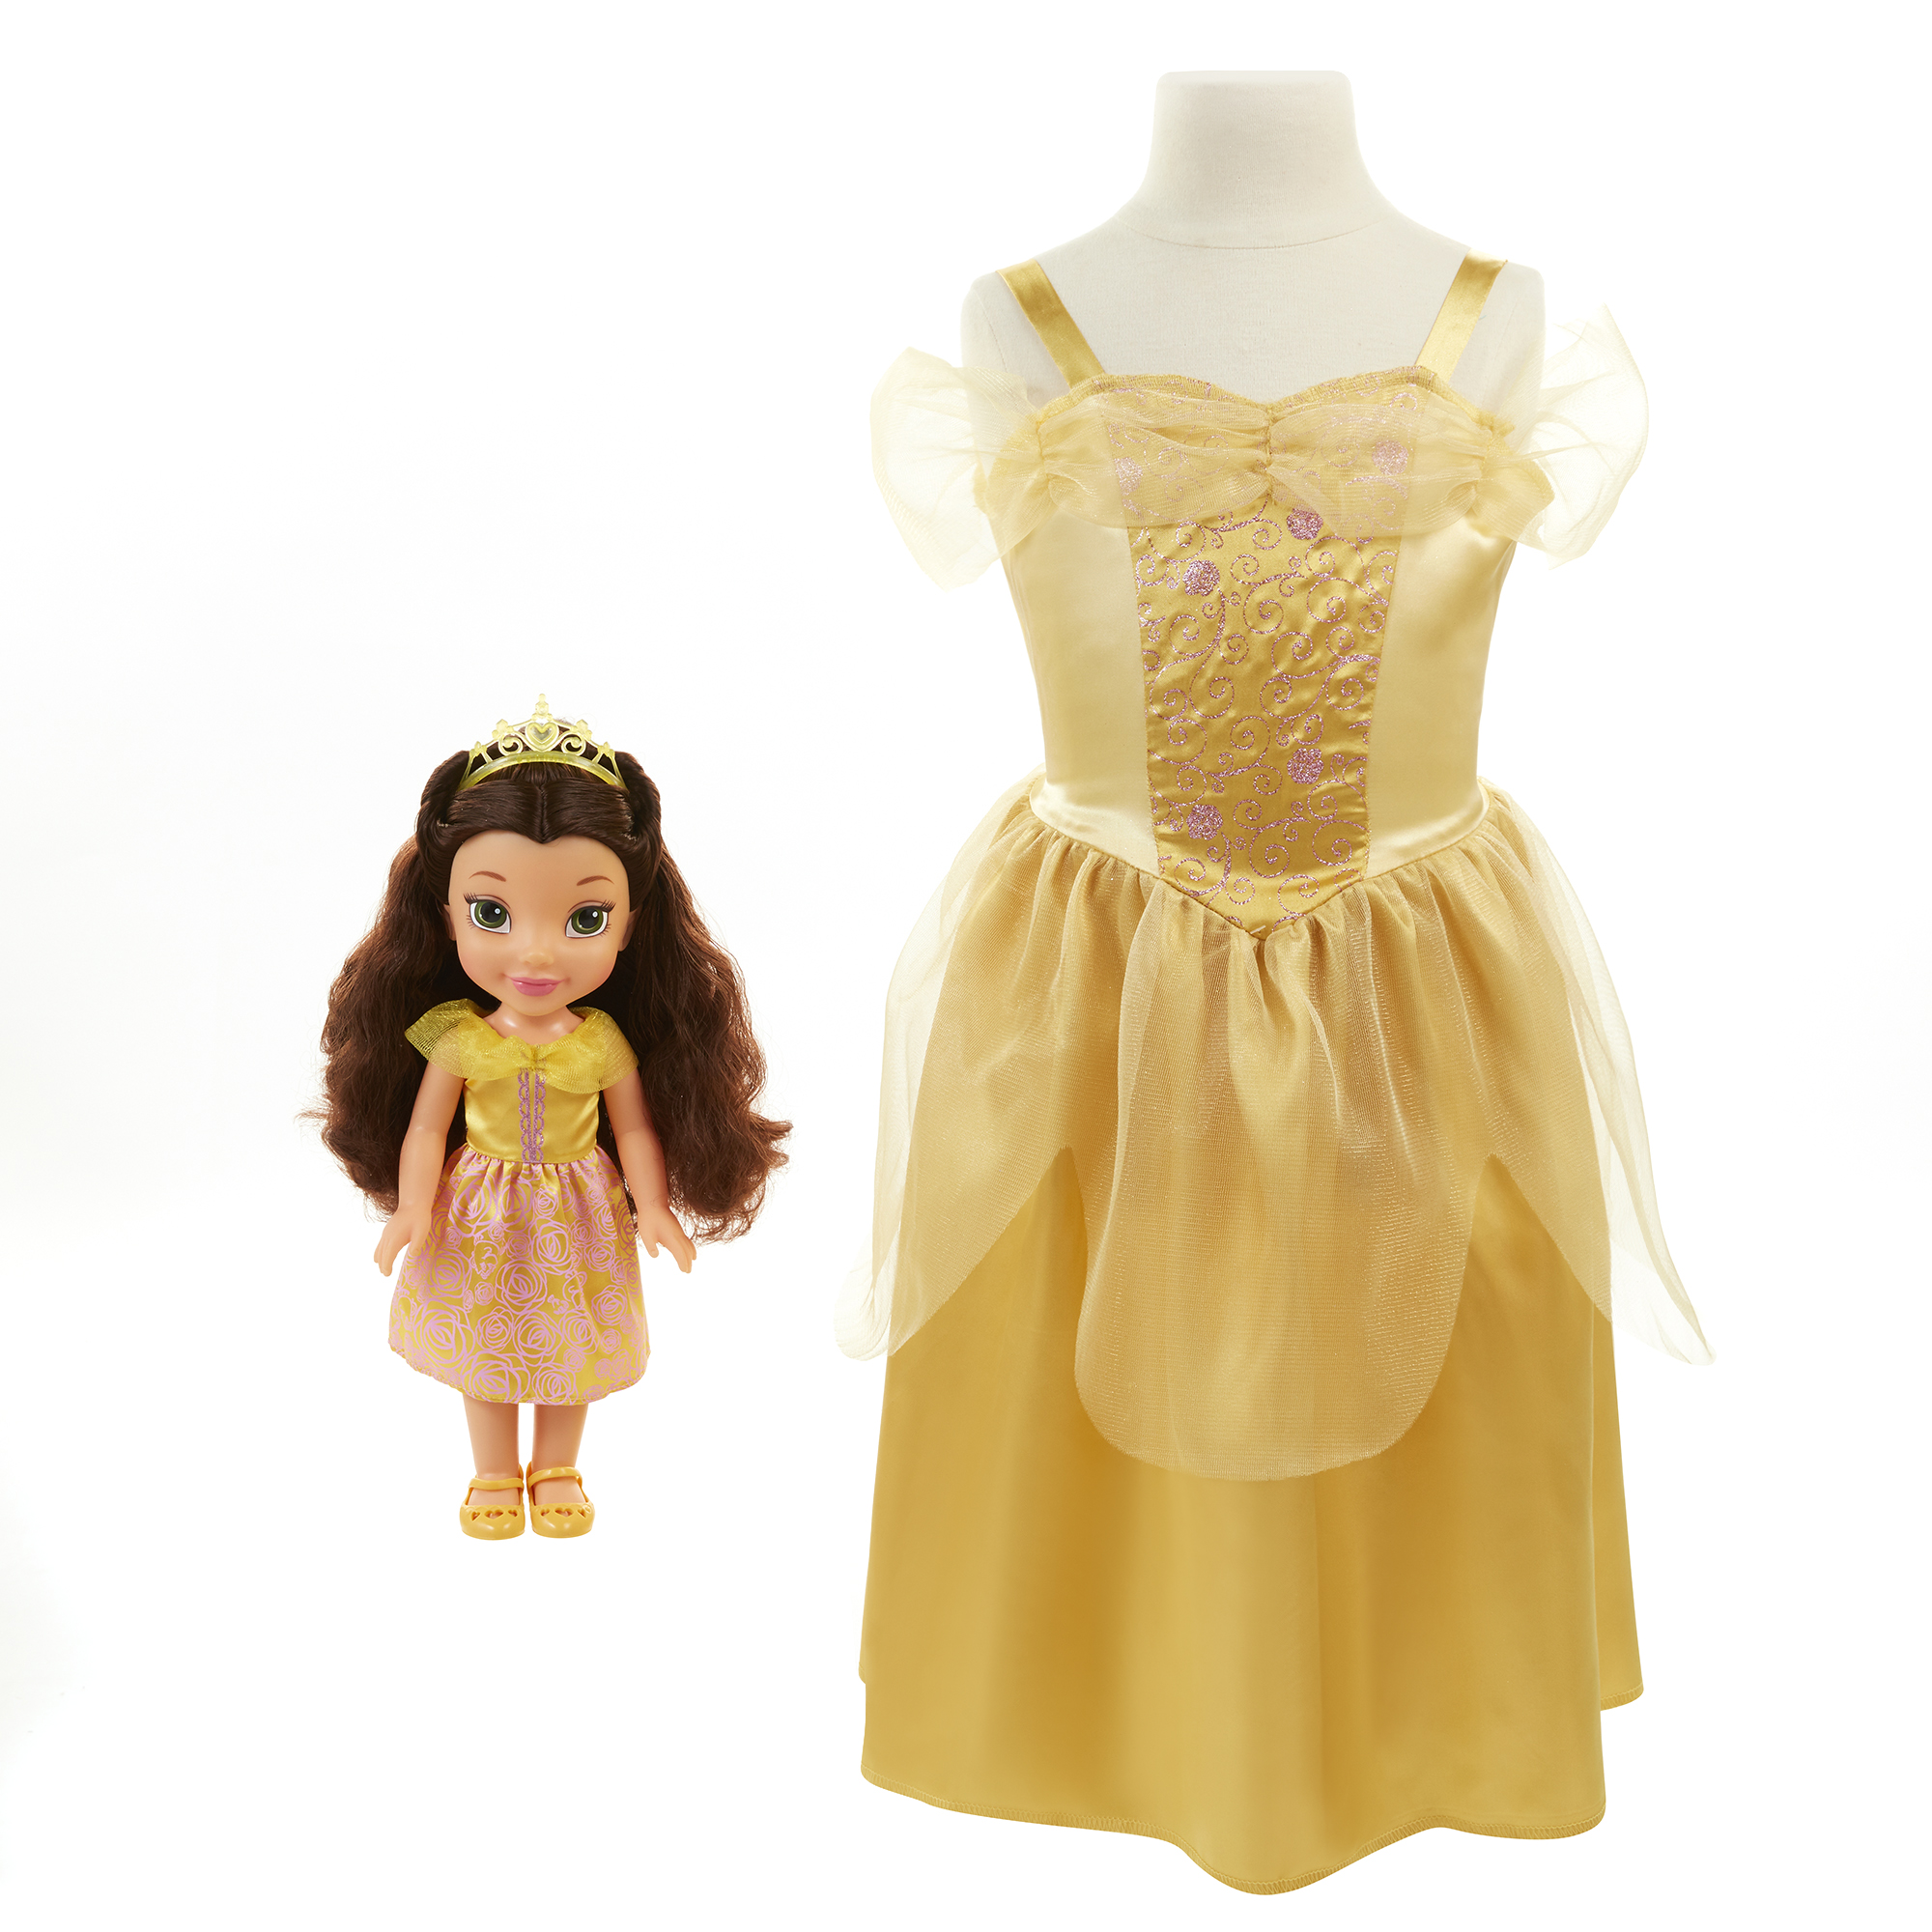 Disney Princess Toddler Doll With Dress: Disney Princess Belle Toddler Doll And Dress